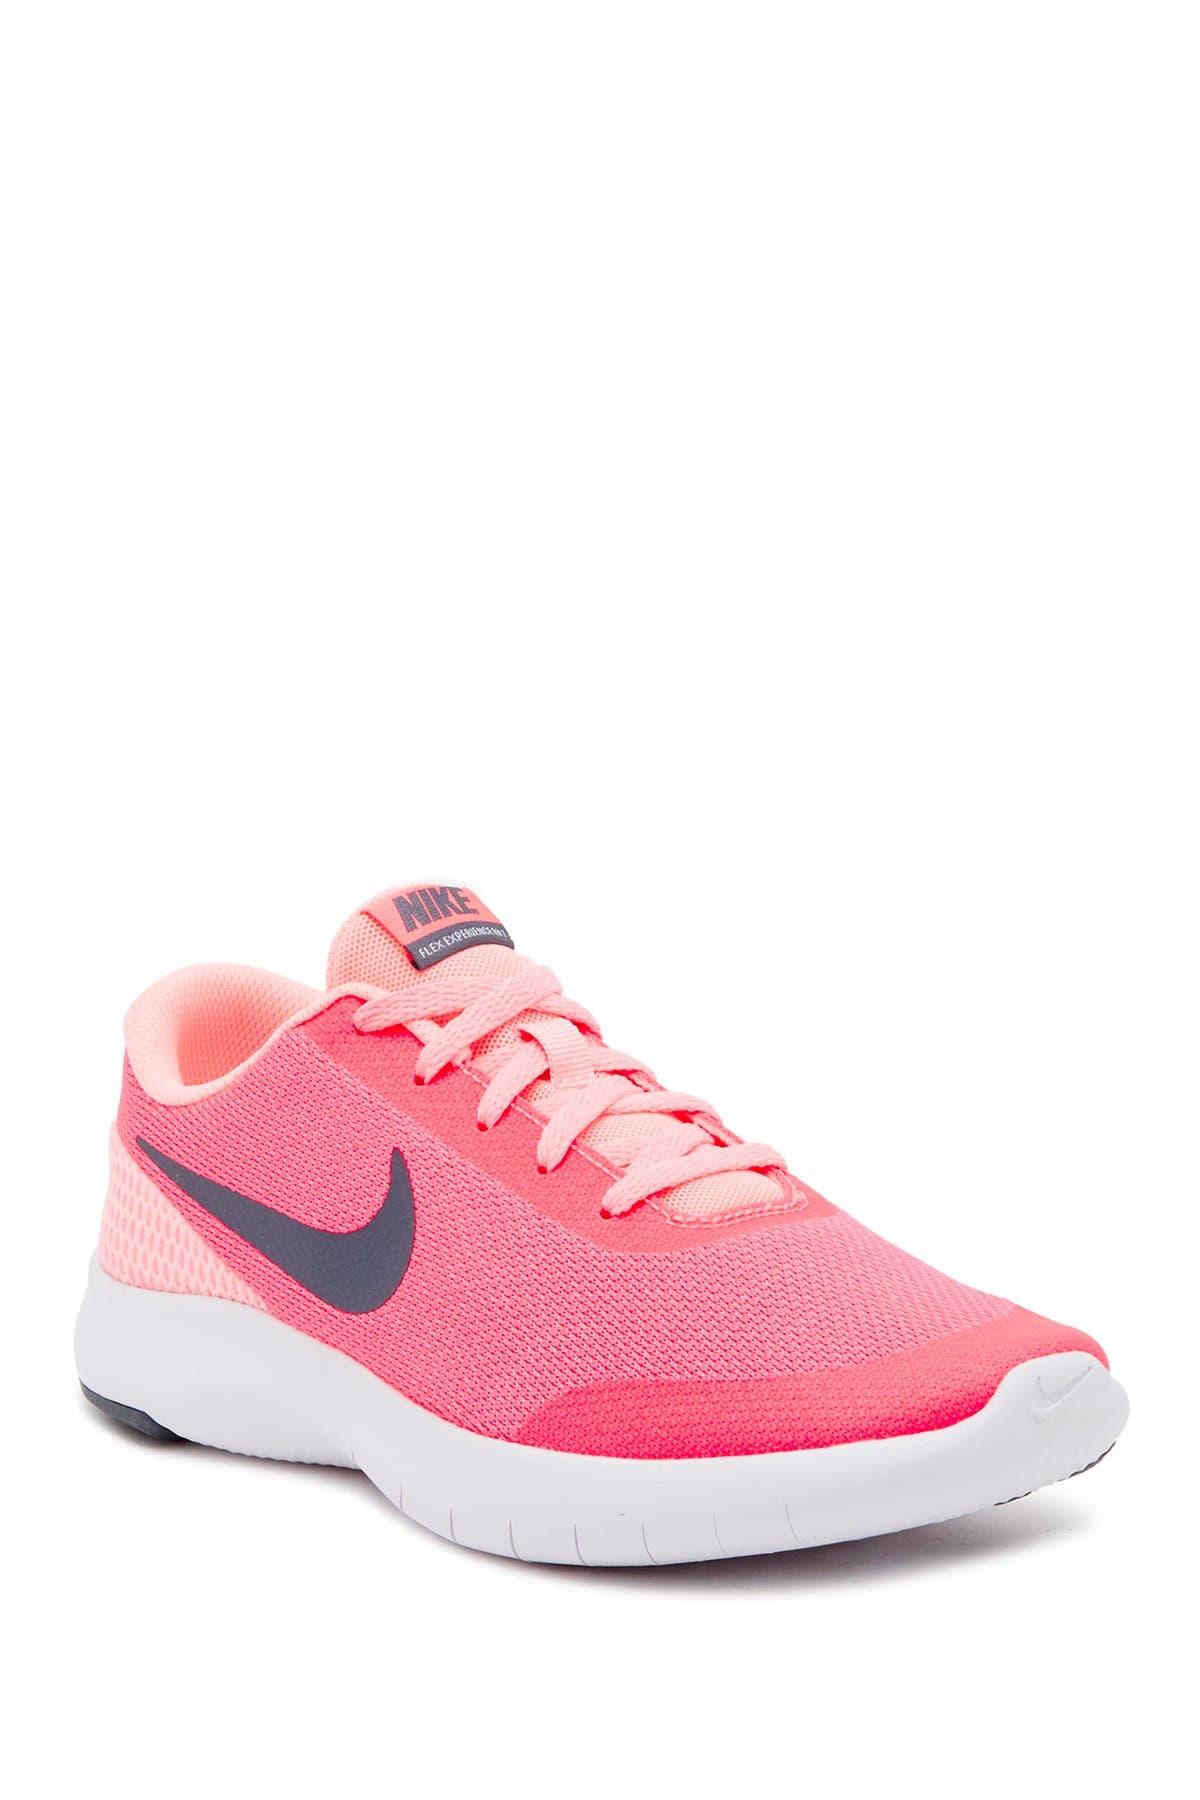 Image of Nike Flex Experience 7 Running Sneaker